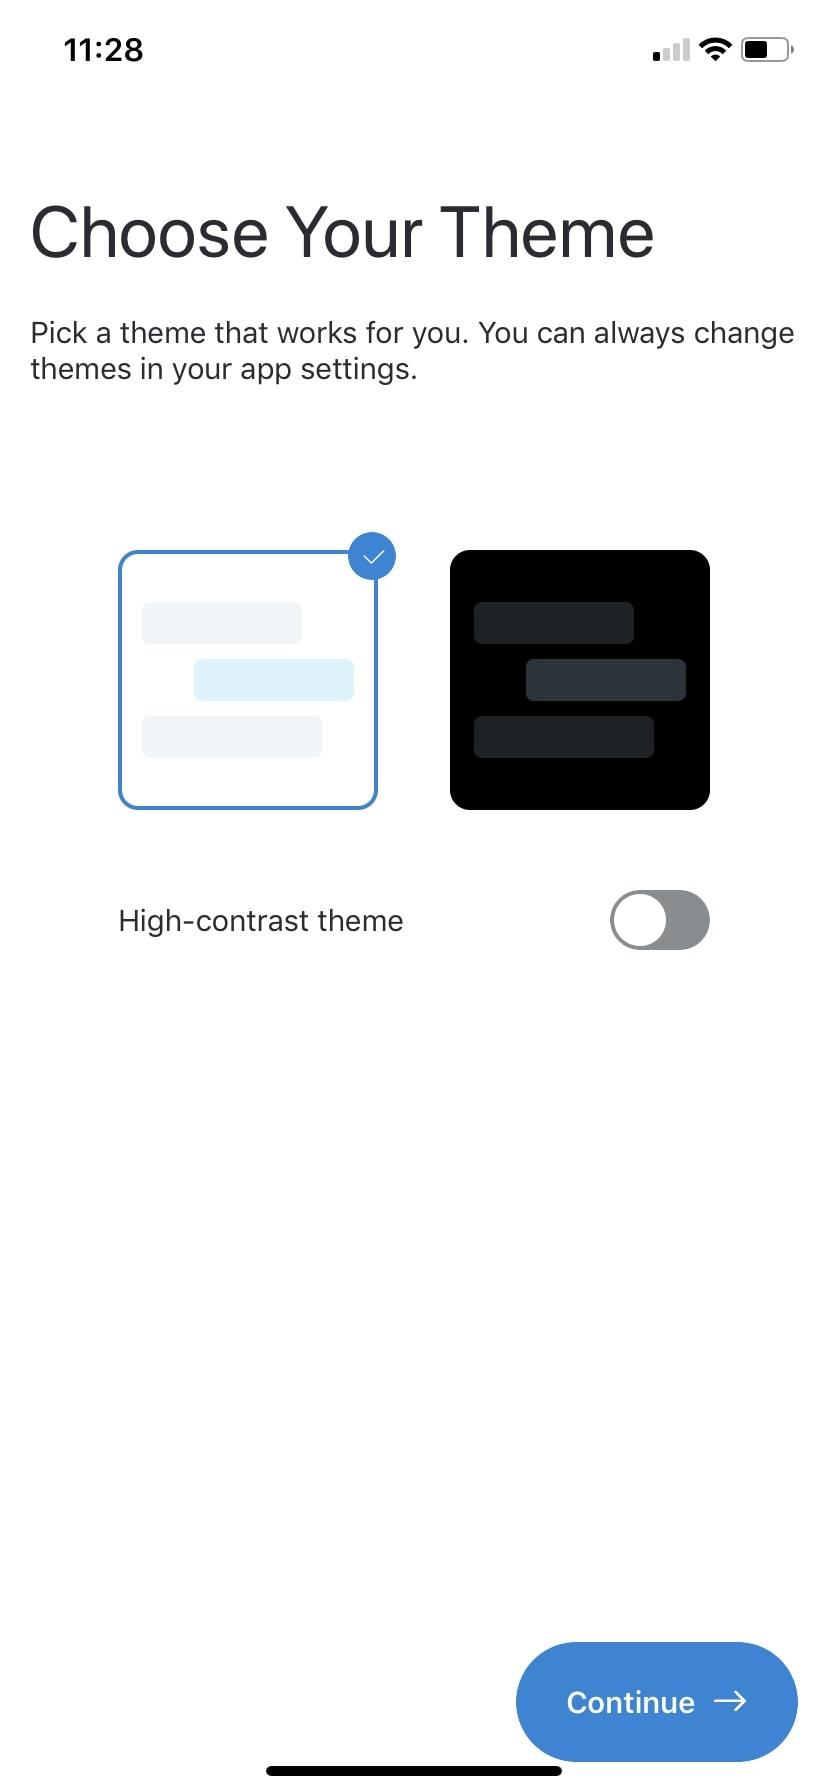 Onboarding Process by Skype in iOS